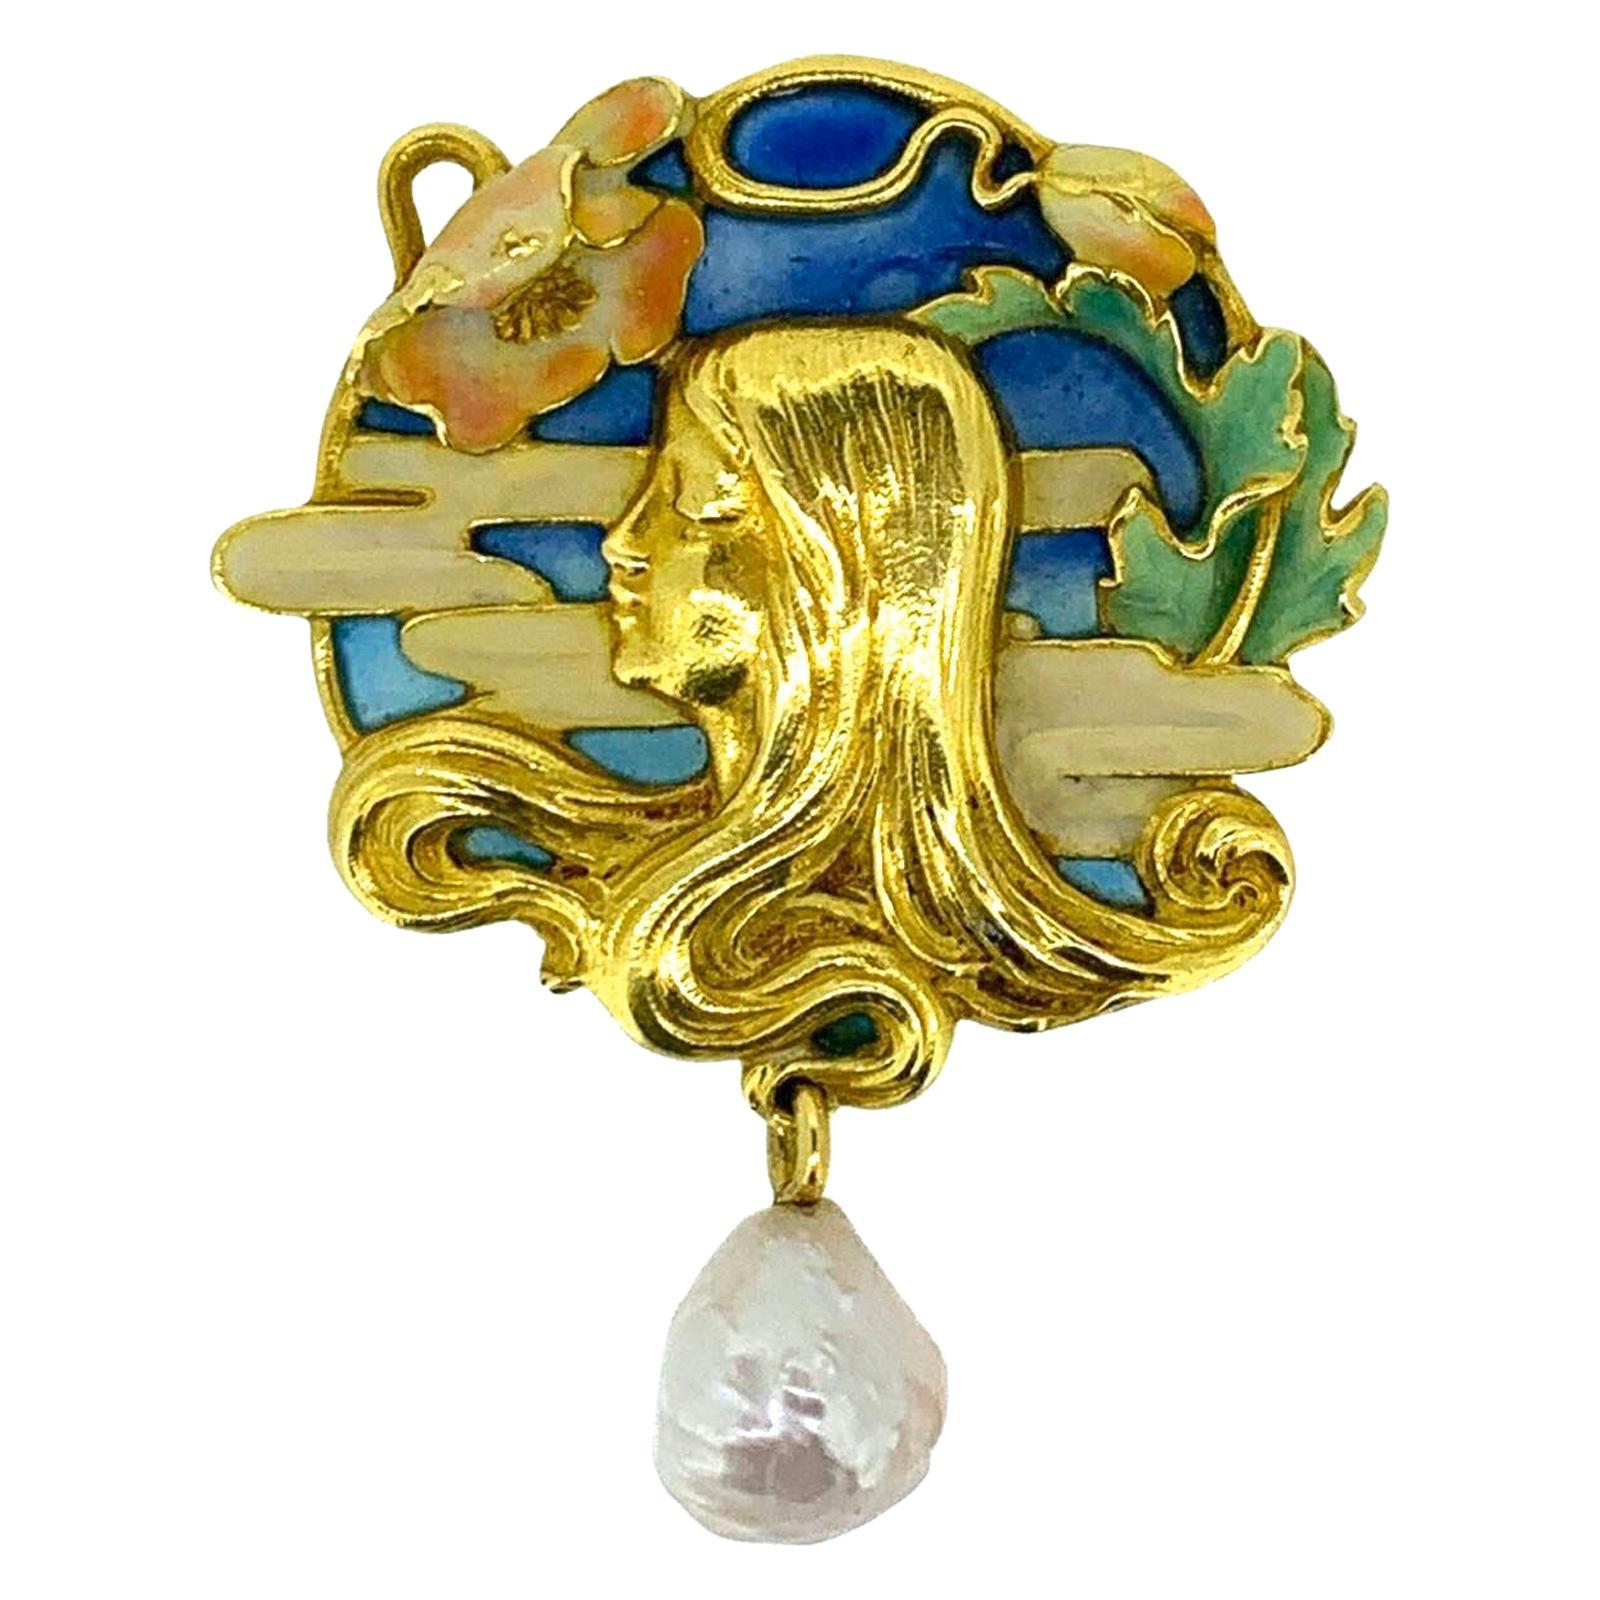 Gemolithos Art Nouveau Enamel and Natural Pearl Pendant, circa 1900s